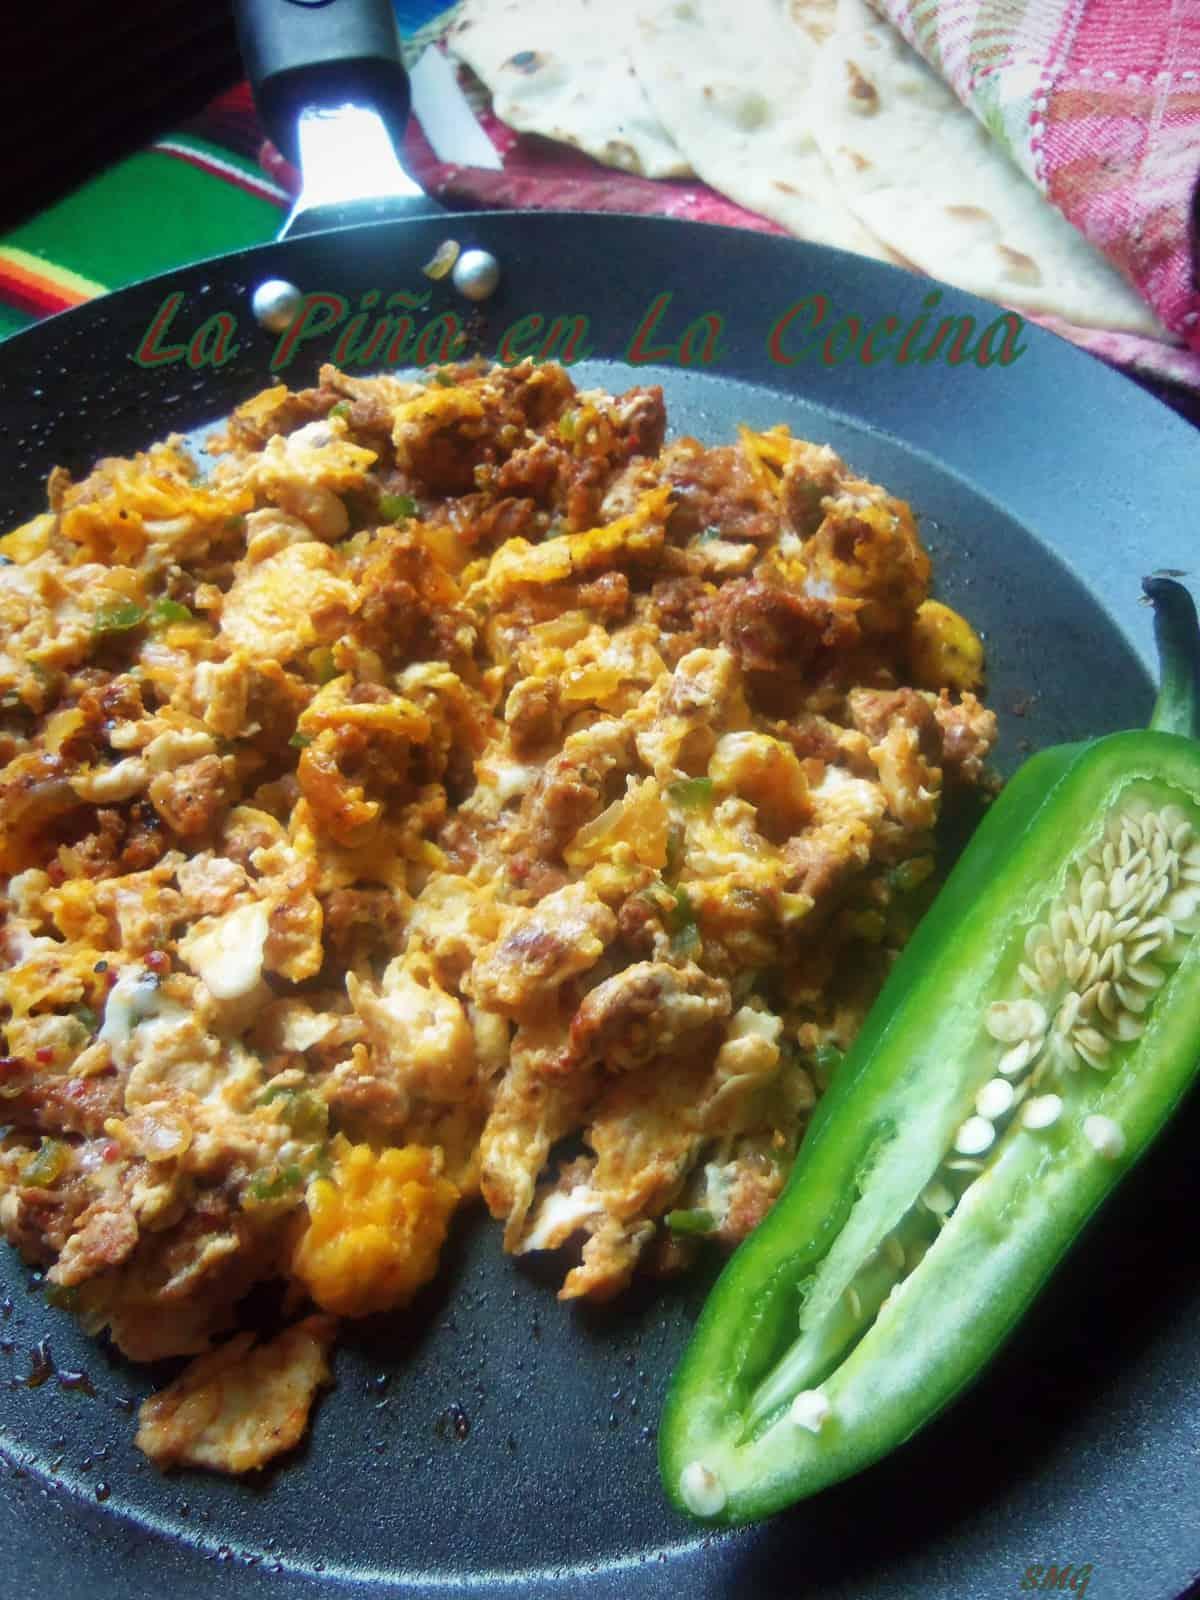 Chorizo con Huevo prepared with homemade pork chorizo